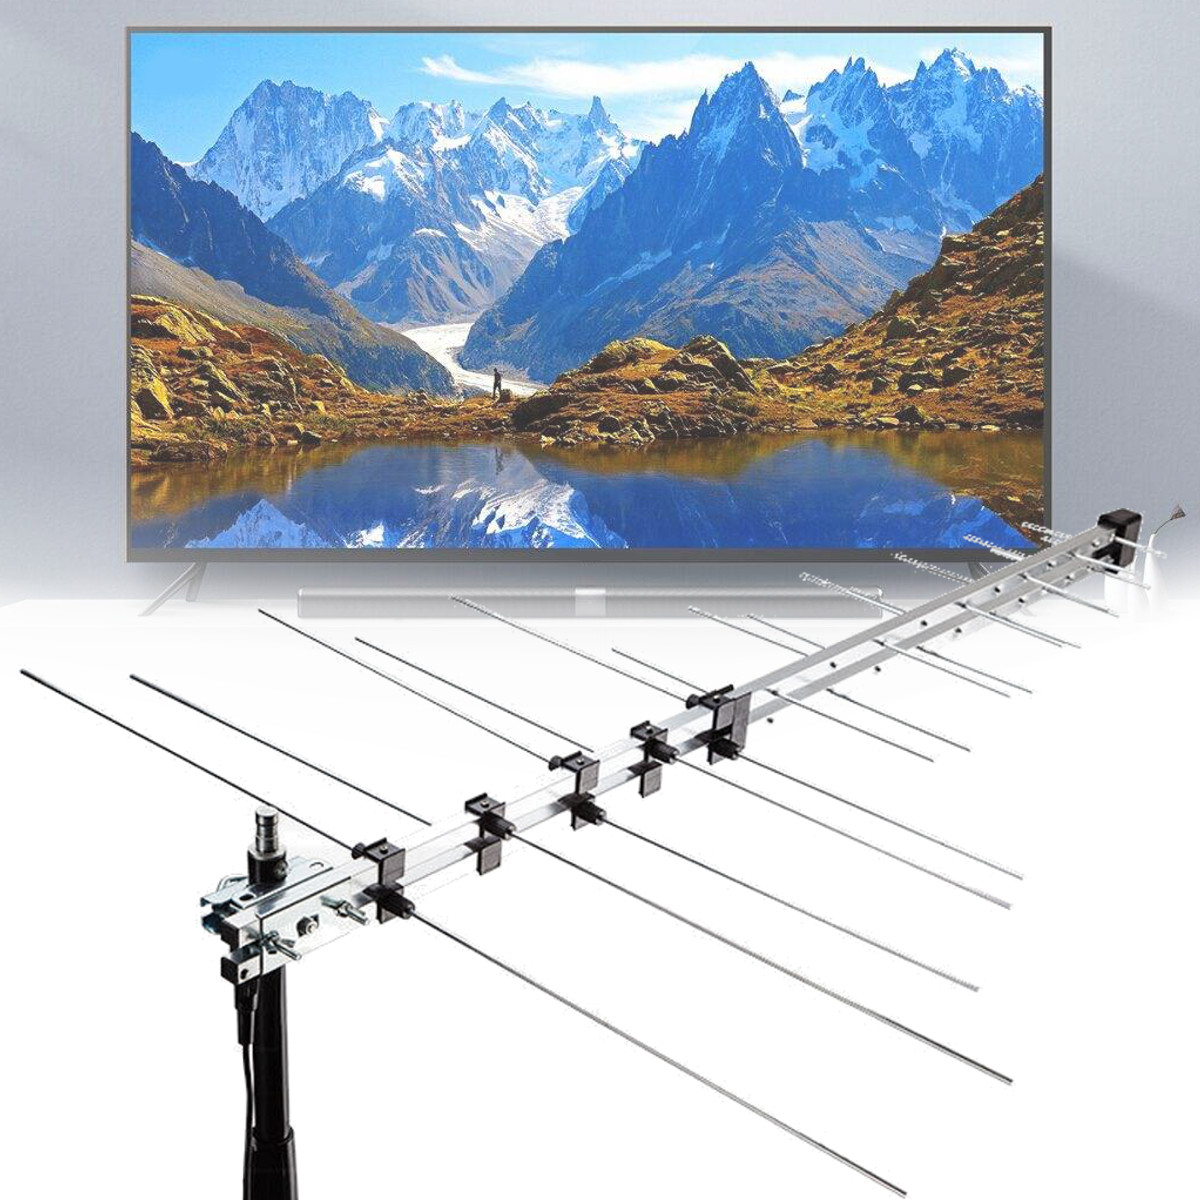 111.5cm 32 Element TV Antenna Outdoor Digital Aerial UHF VHF HD FM Amplified 8.5db DVB-T Signal Booster TV Receiver Accessories111.5cm 32 Element TV Antenna Outdoor Digital Aerial UHF VHF HD FM Amplified 8.5db DVB-T Signal Booster TV Receiver Accessories